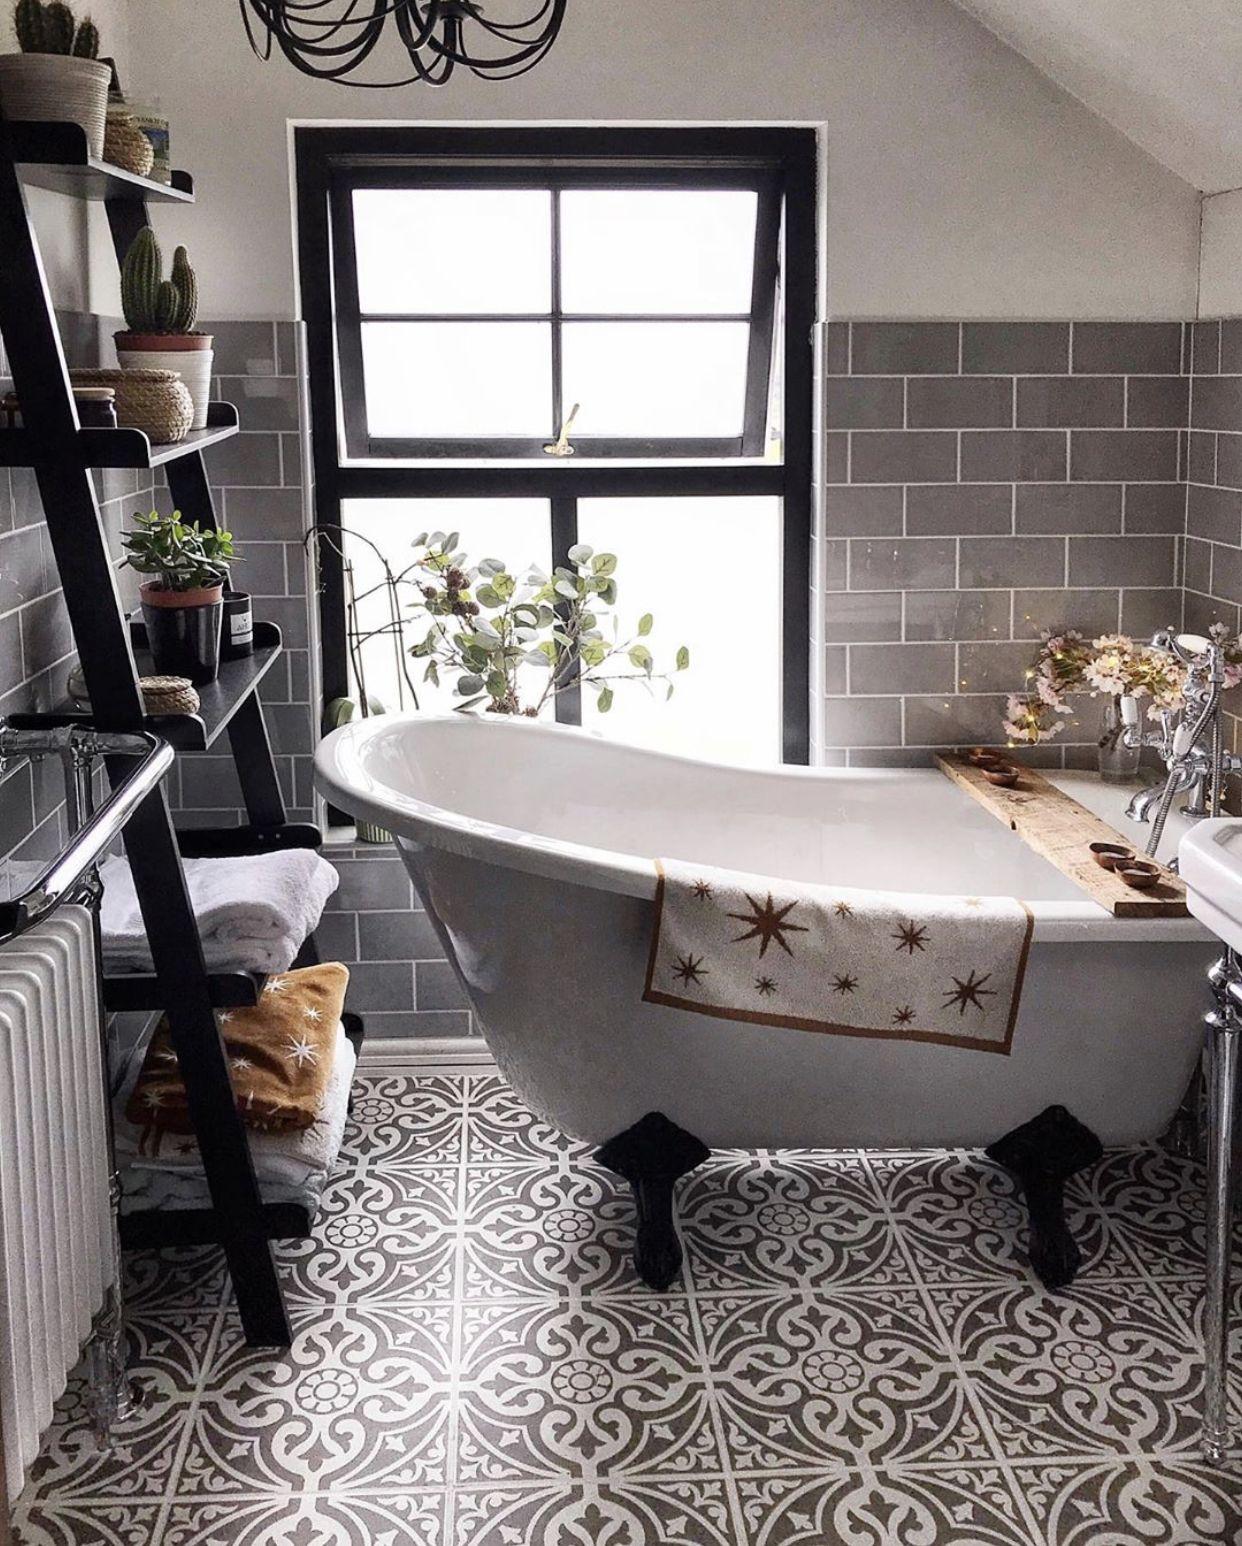 5 Gorgeous Scandinavian Bathroom Ideas: Hampton Grey Feature Tiles 33x33cm In 2020